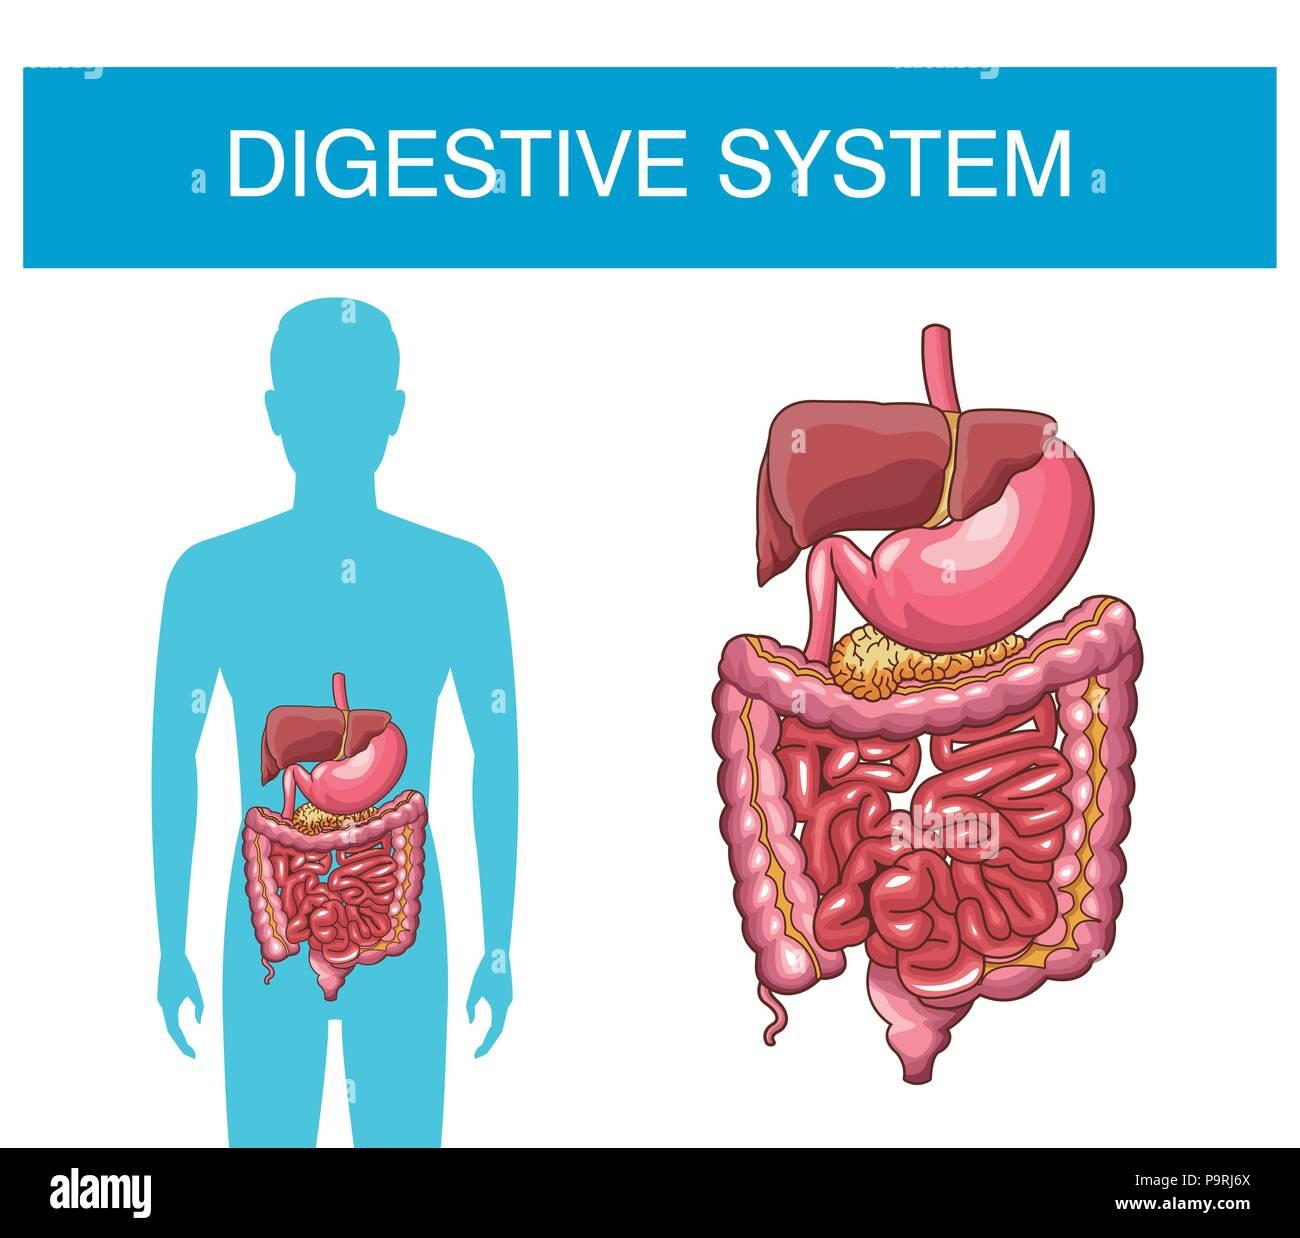 Digestive System Human Organs Vector Illustration Graphic Design Torso Diagram